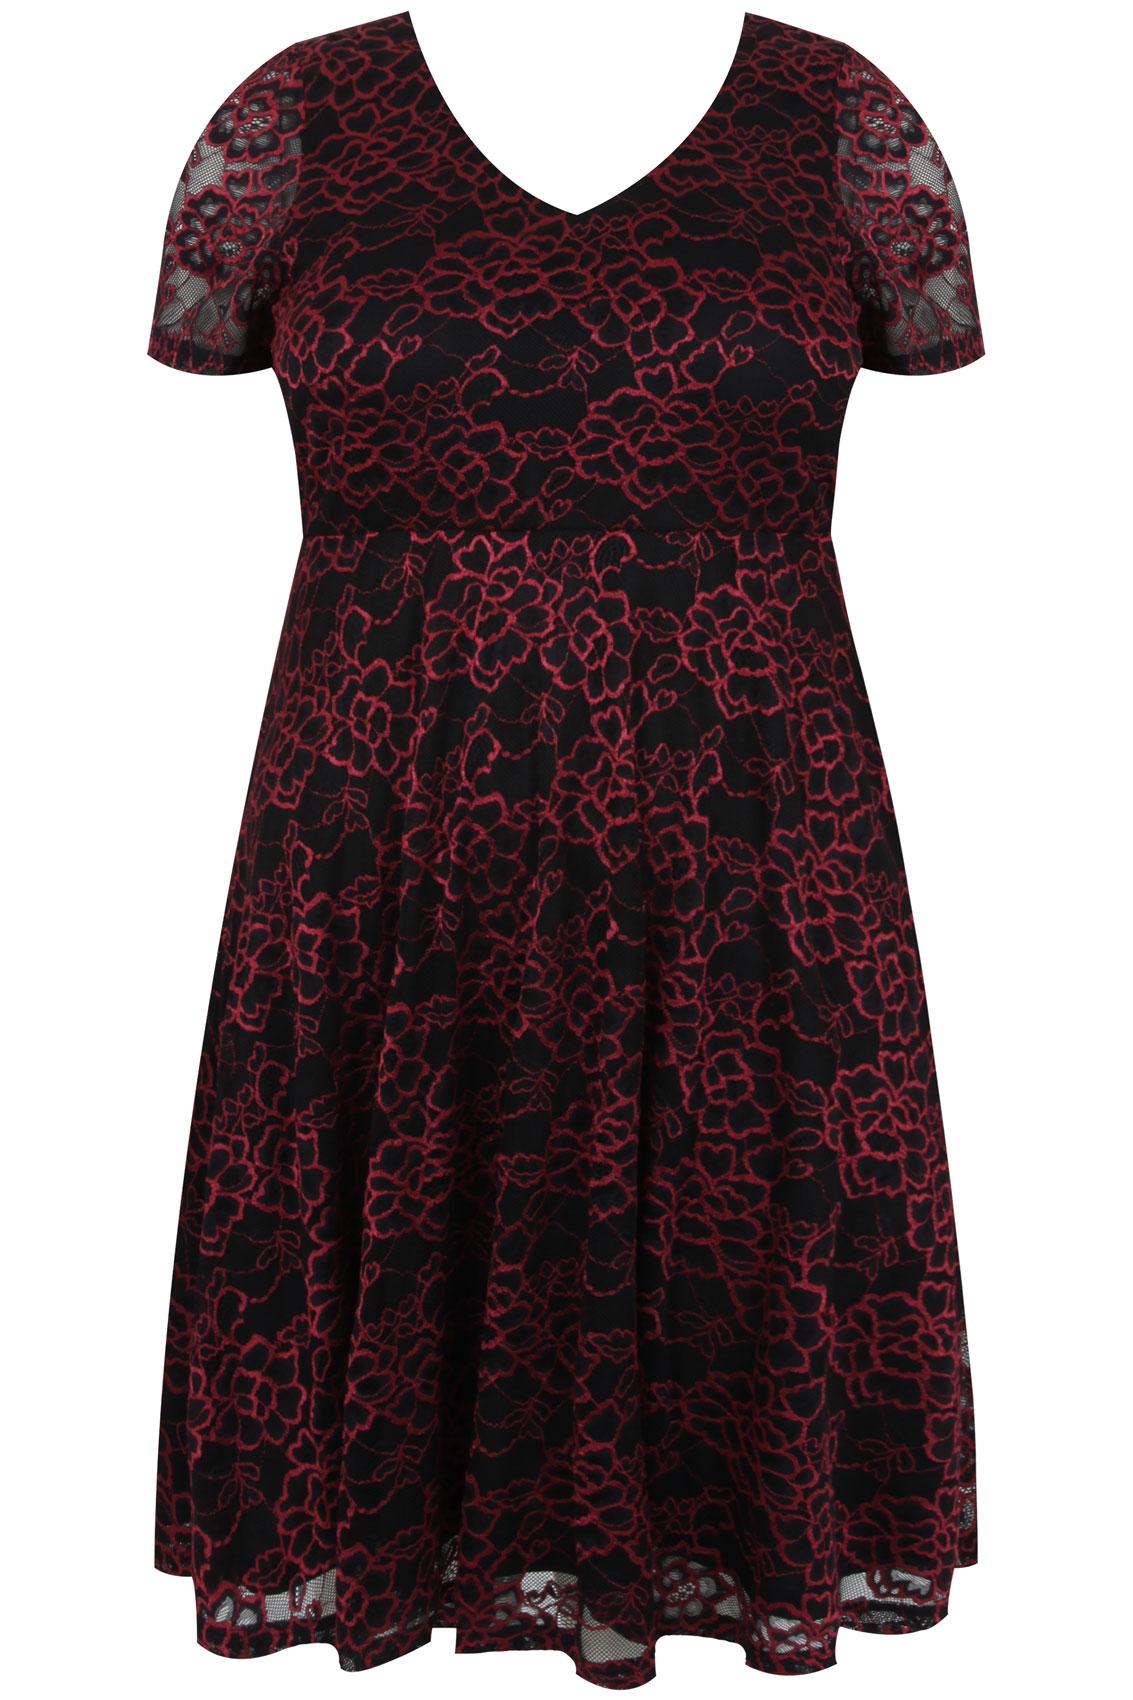 plus size attire online purchasing